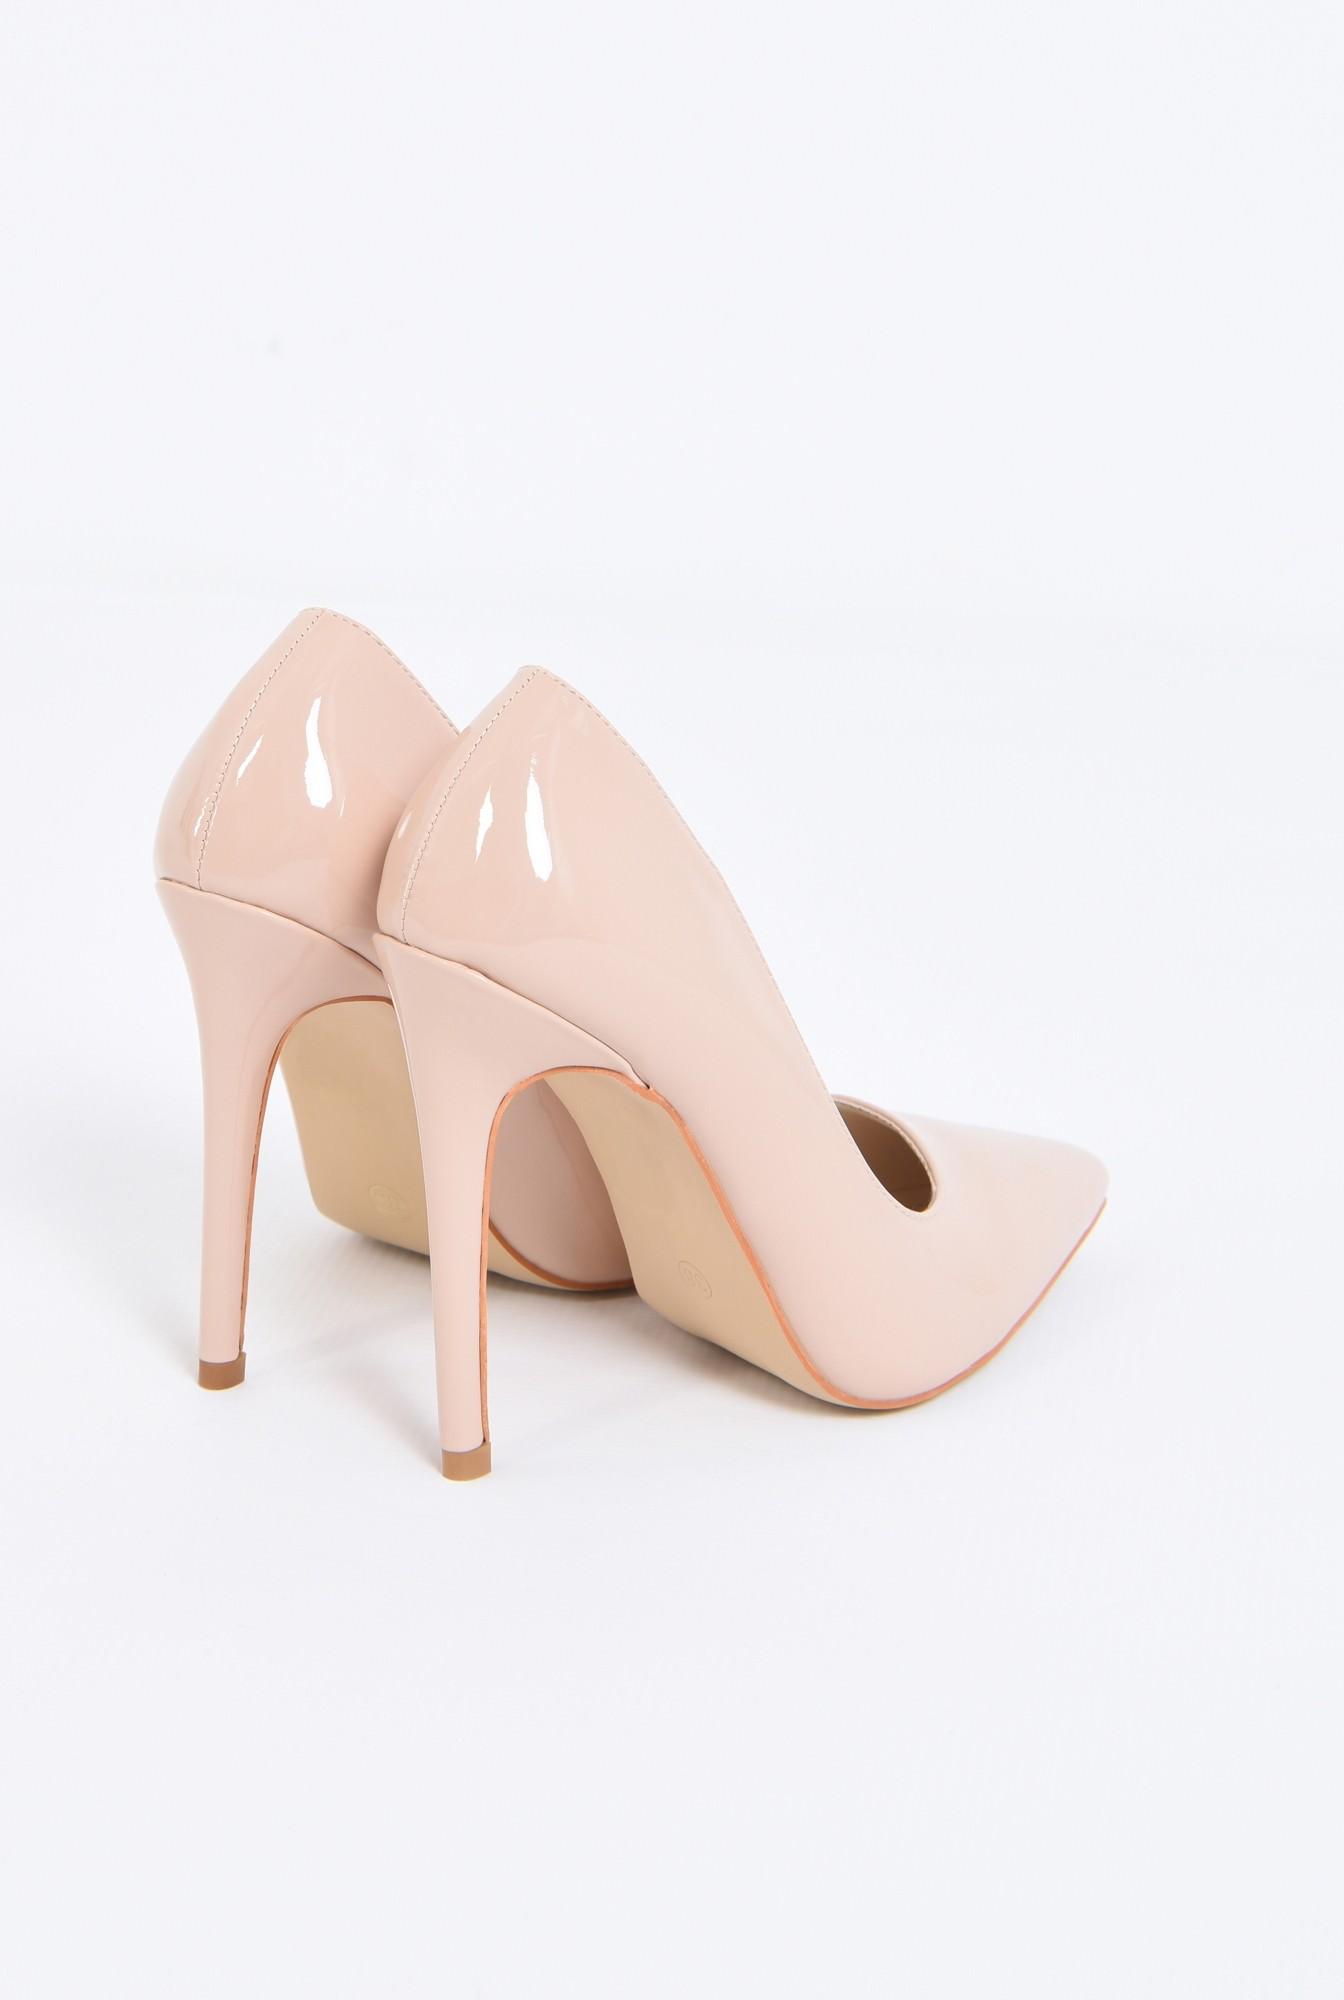 2 - pantofi eleganti, crem, toc inalt, varf ascutit